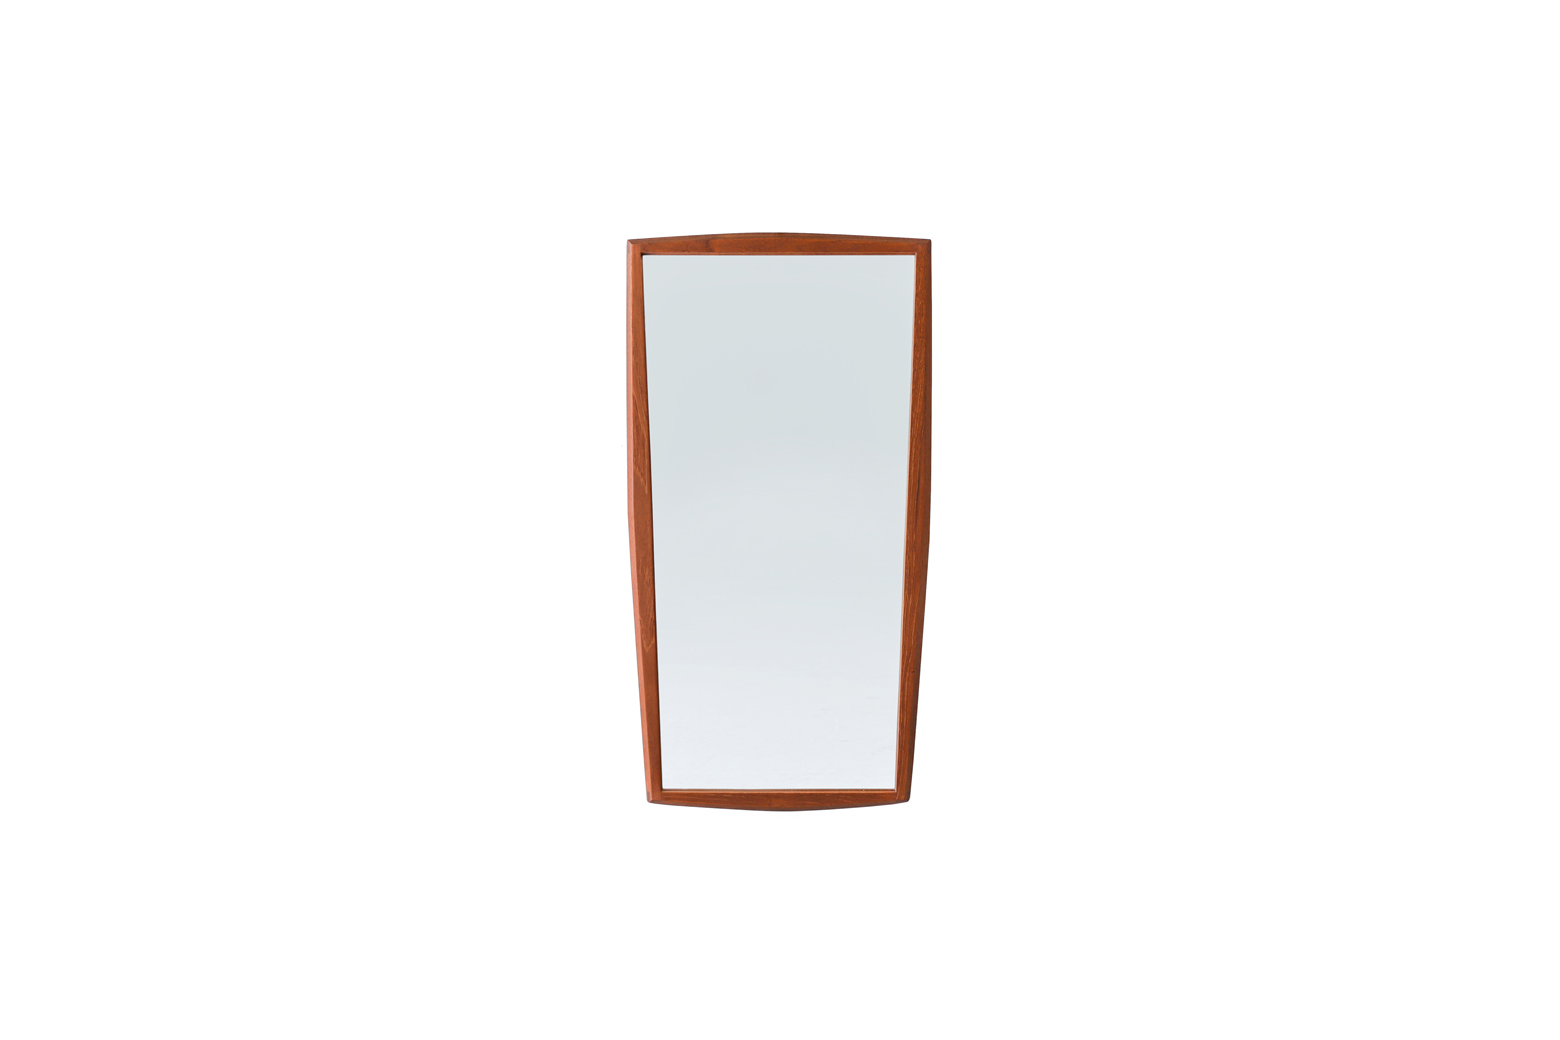 Danish Vintage Jansen Spejle Teak Frame Wall Mirror/デンマークヴィンテージ ウォールミラー チークフレーム 壁掛け鏡 インテリア 北欧デザイン ミッドセンチュリーモダン